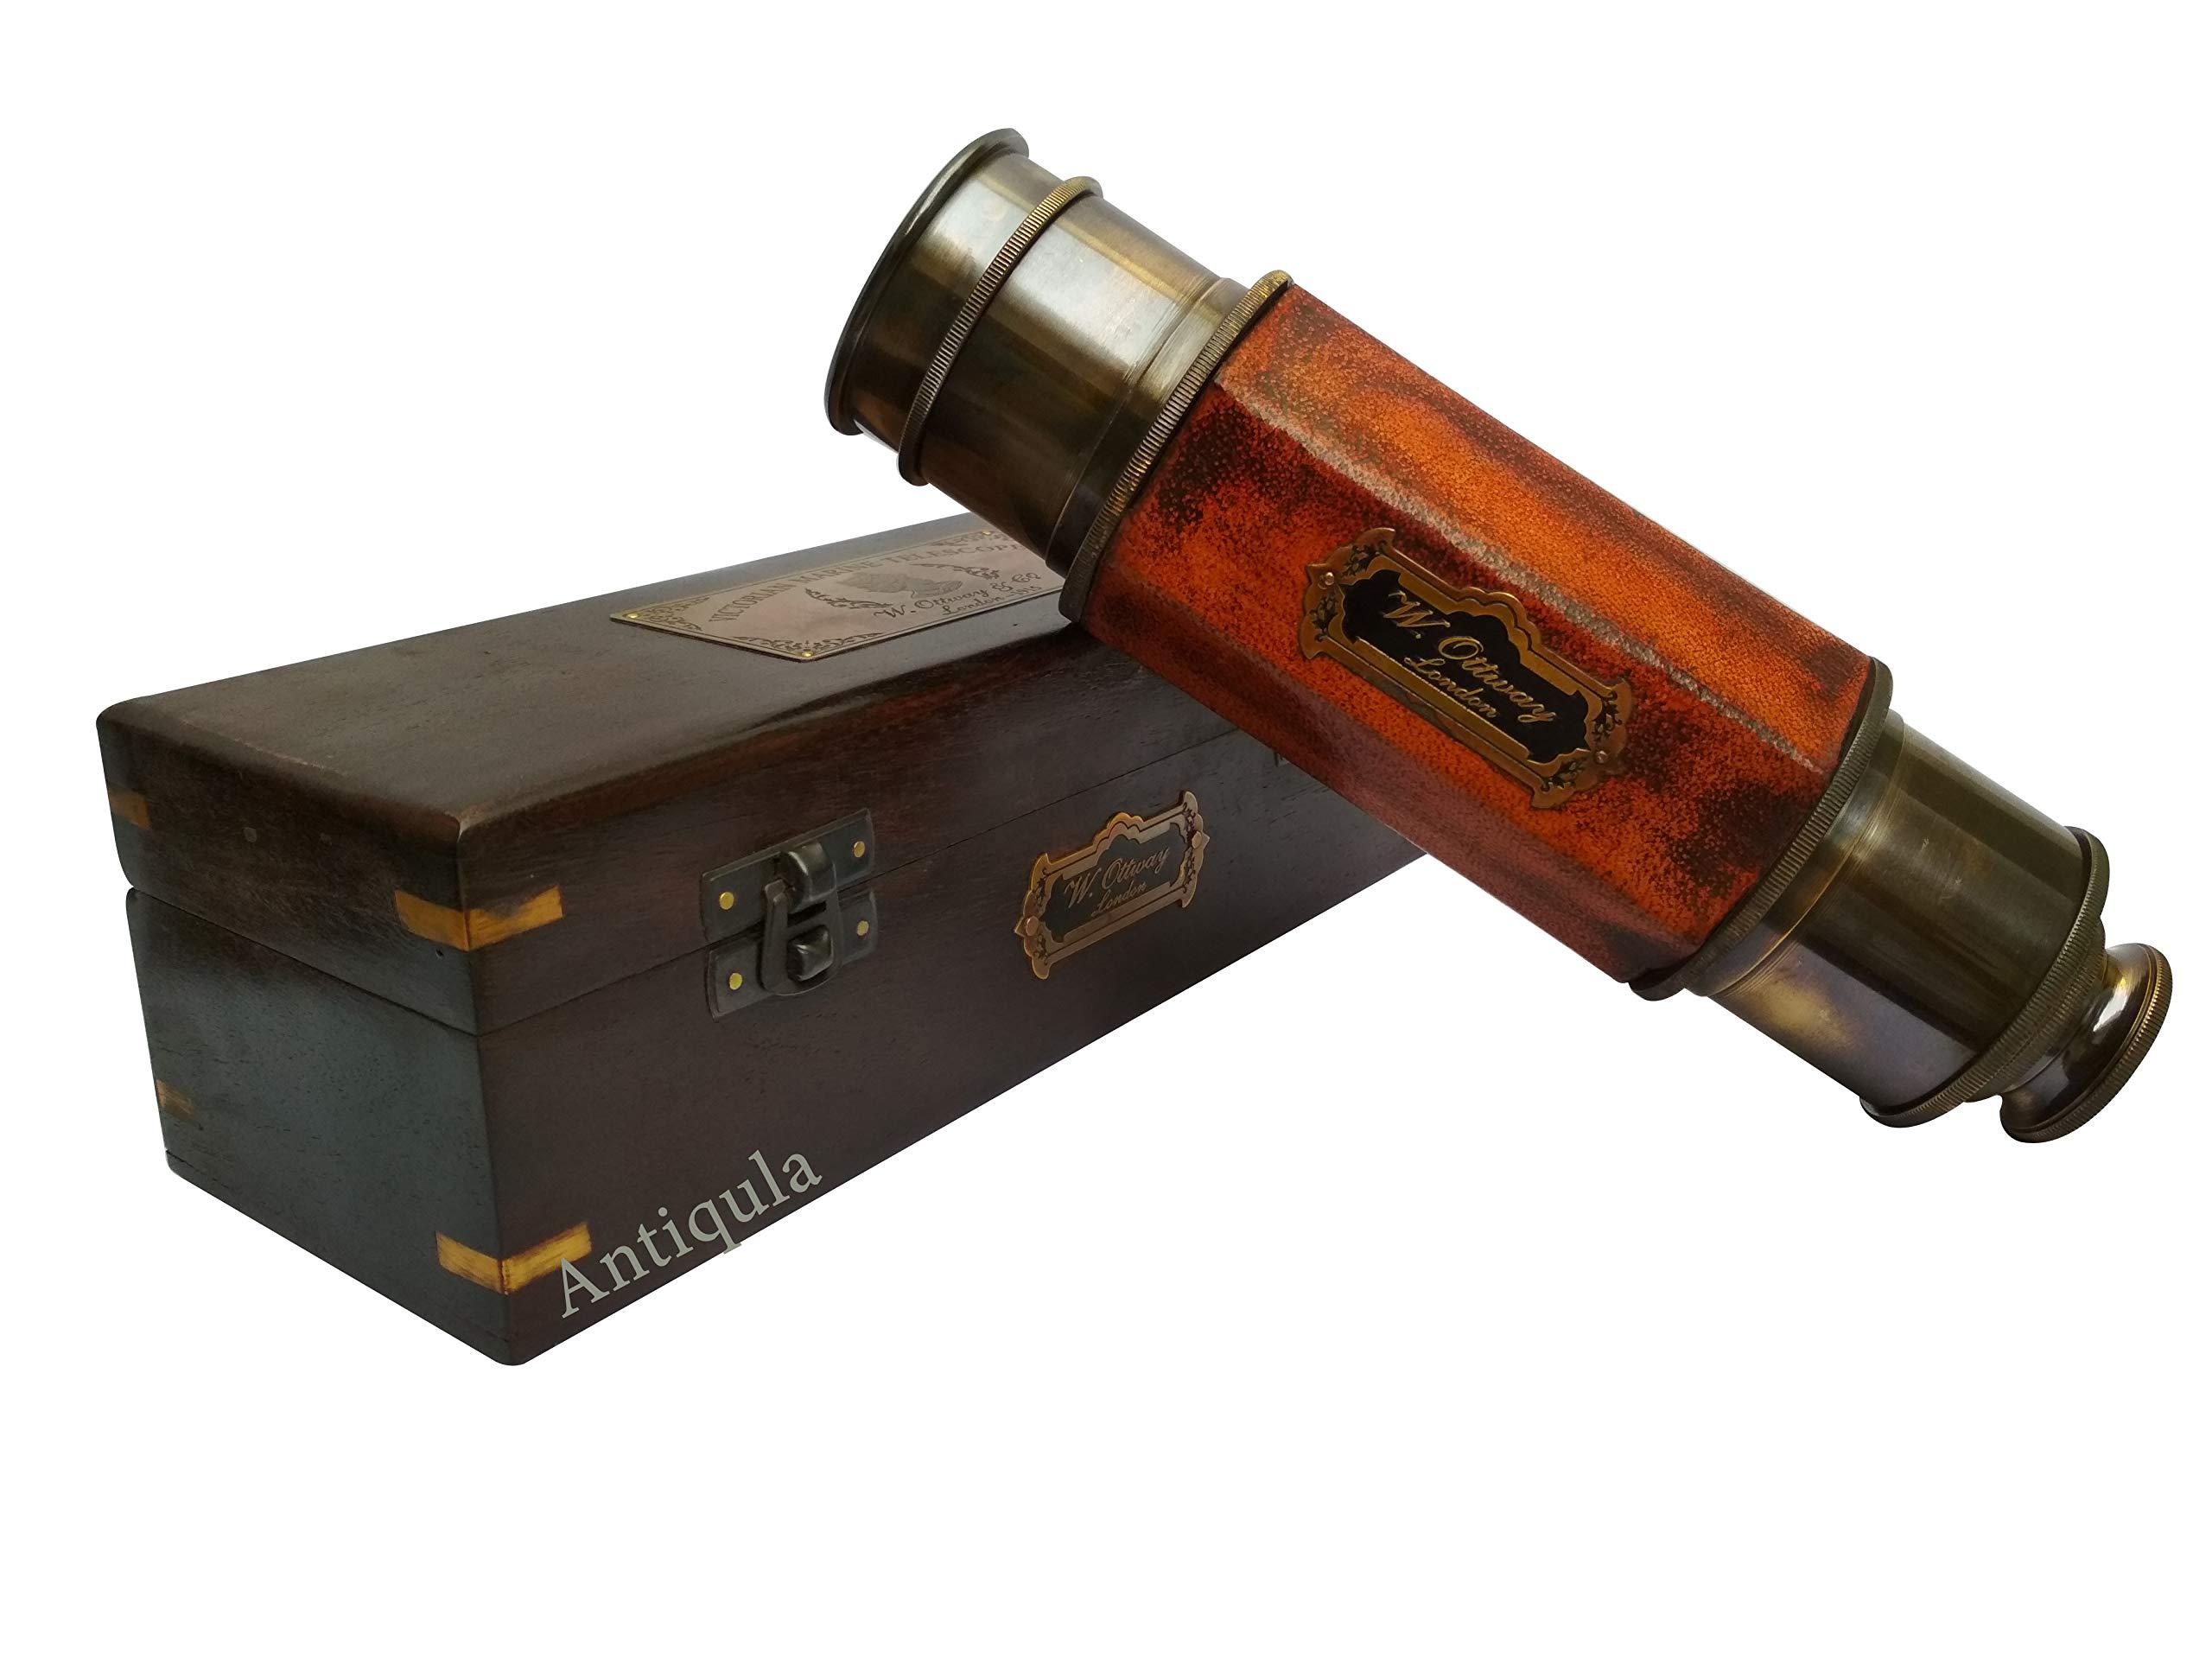 Antique Brass Hexagonal Spyglass Replica in Wooden Box & 25 inch Long - Brass Spy Glass Pirate Telescope in Wooden Box Antique Replica Vintage